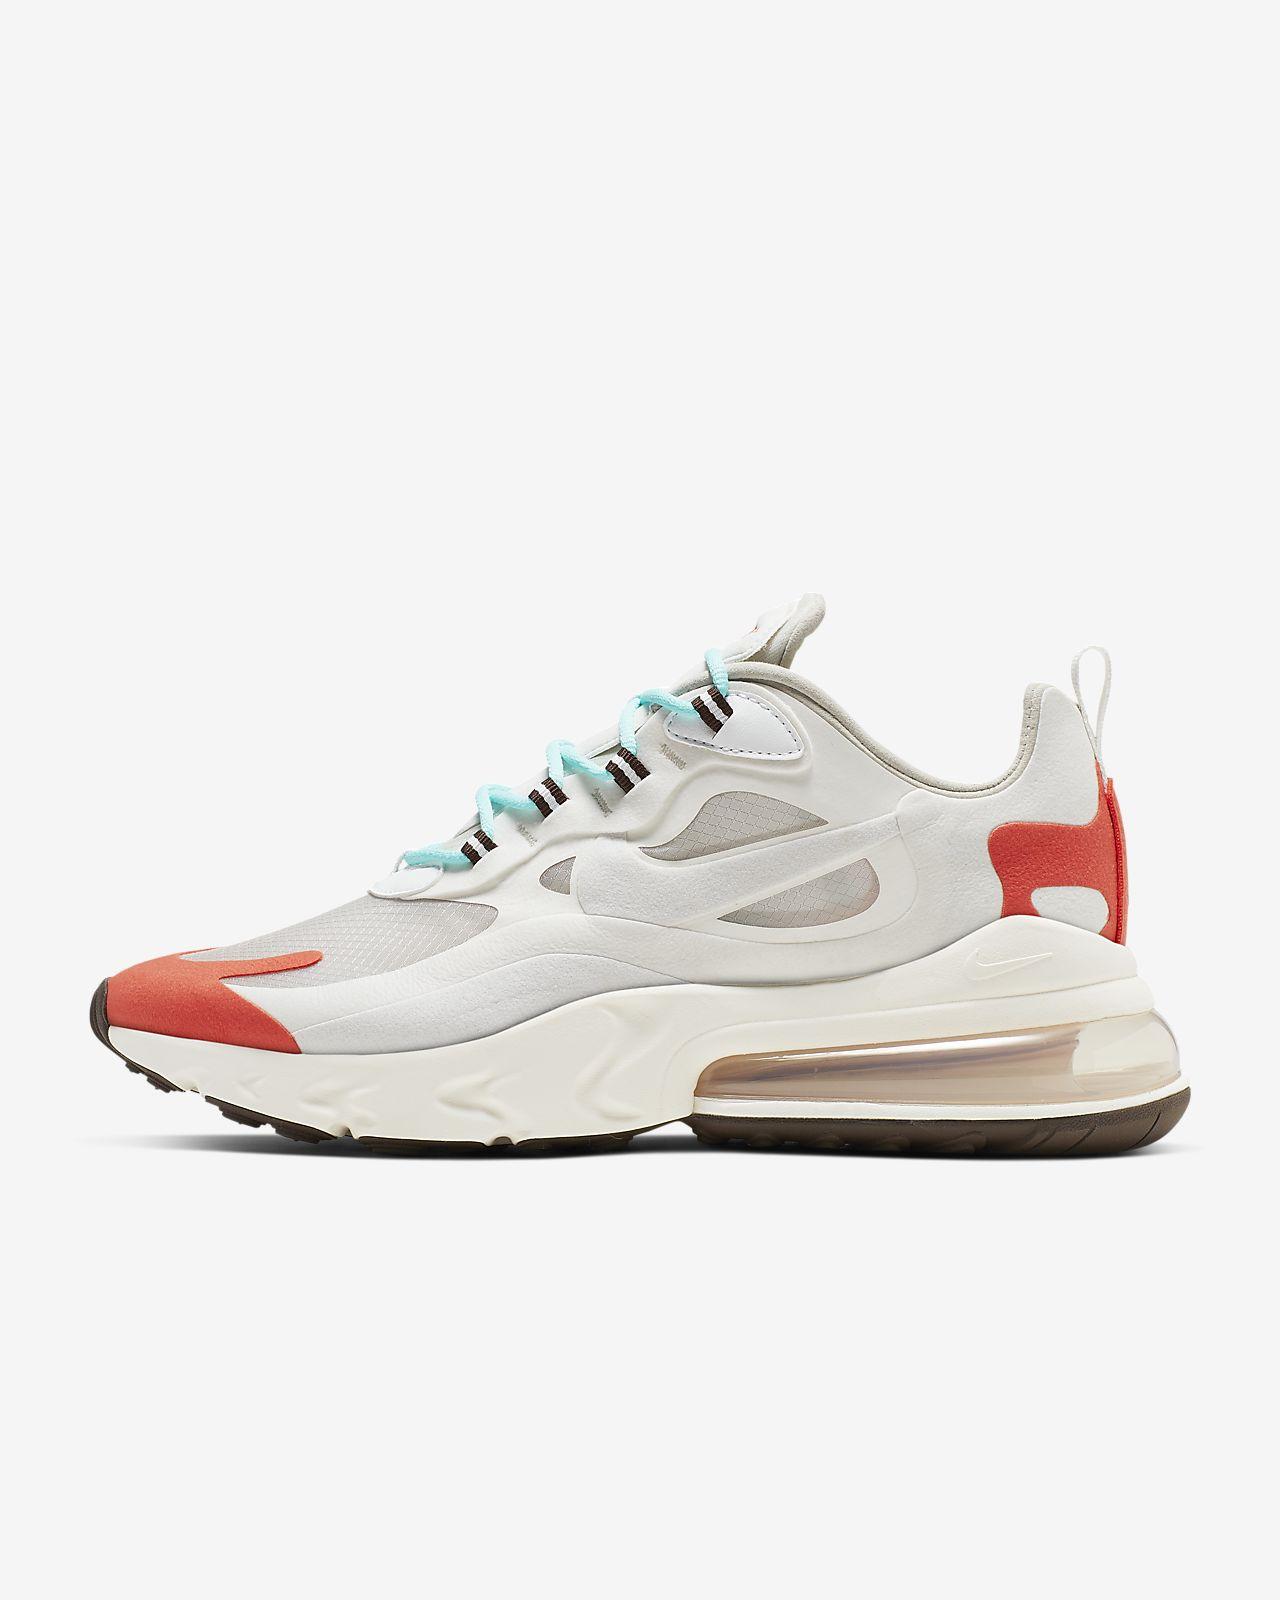 Nike Air Max 270 React (Mid-Century Art)-sko til mænd